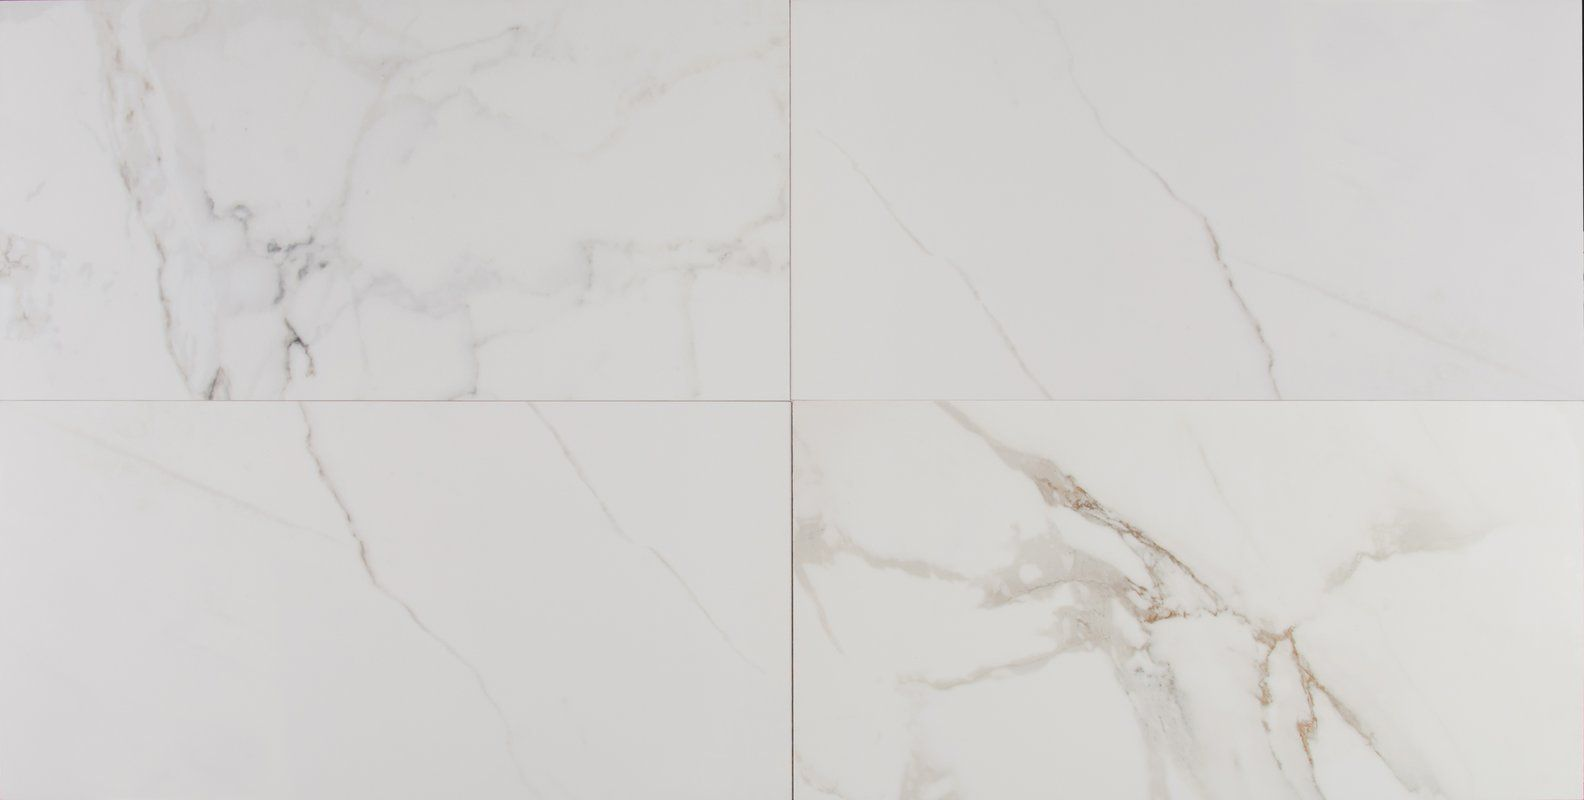 Pietra 12 X 24 Porcelain Stone Look Wall Floor Tile Porcelain Floor And Wall Tile Flooring